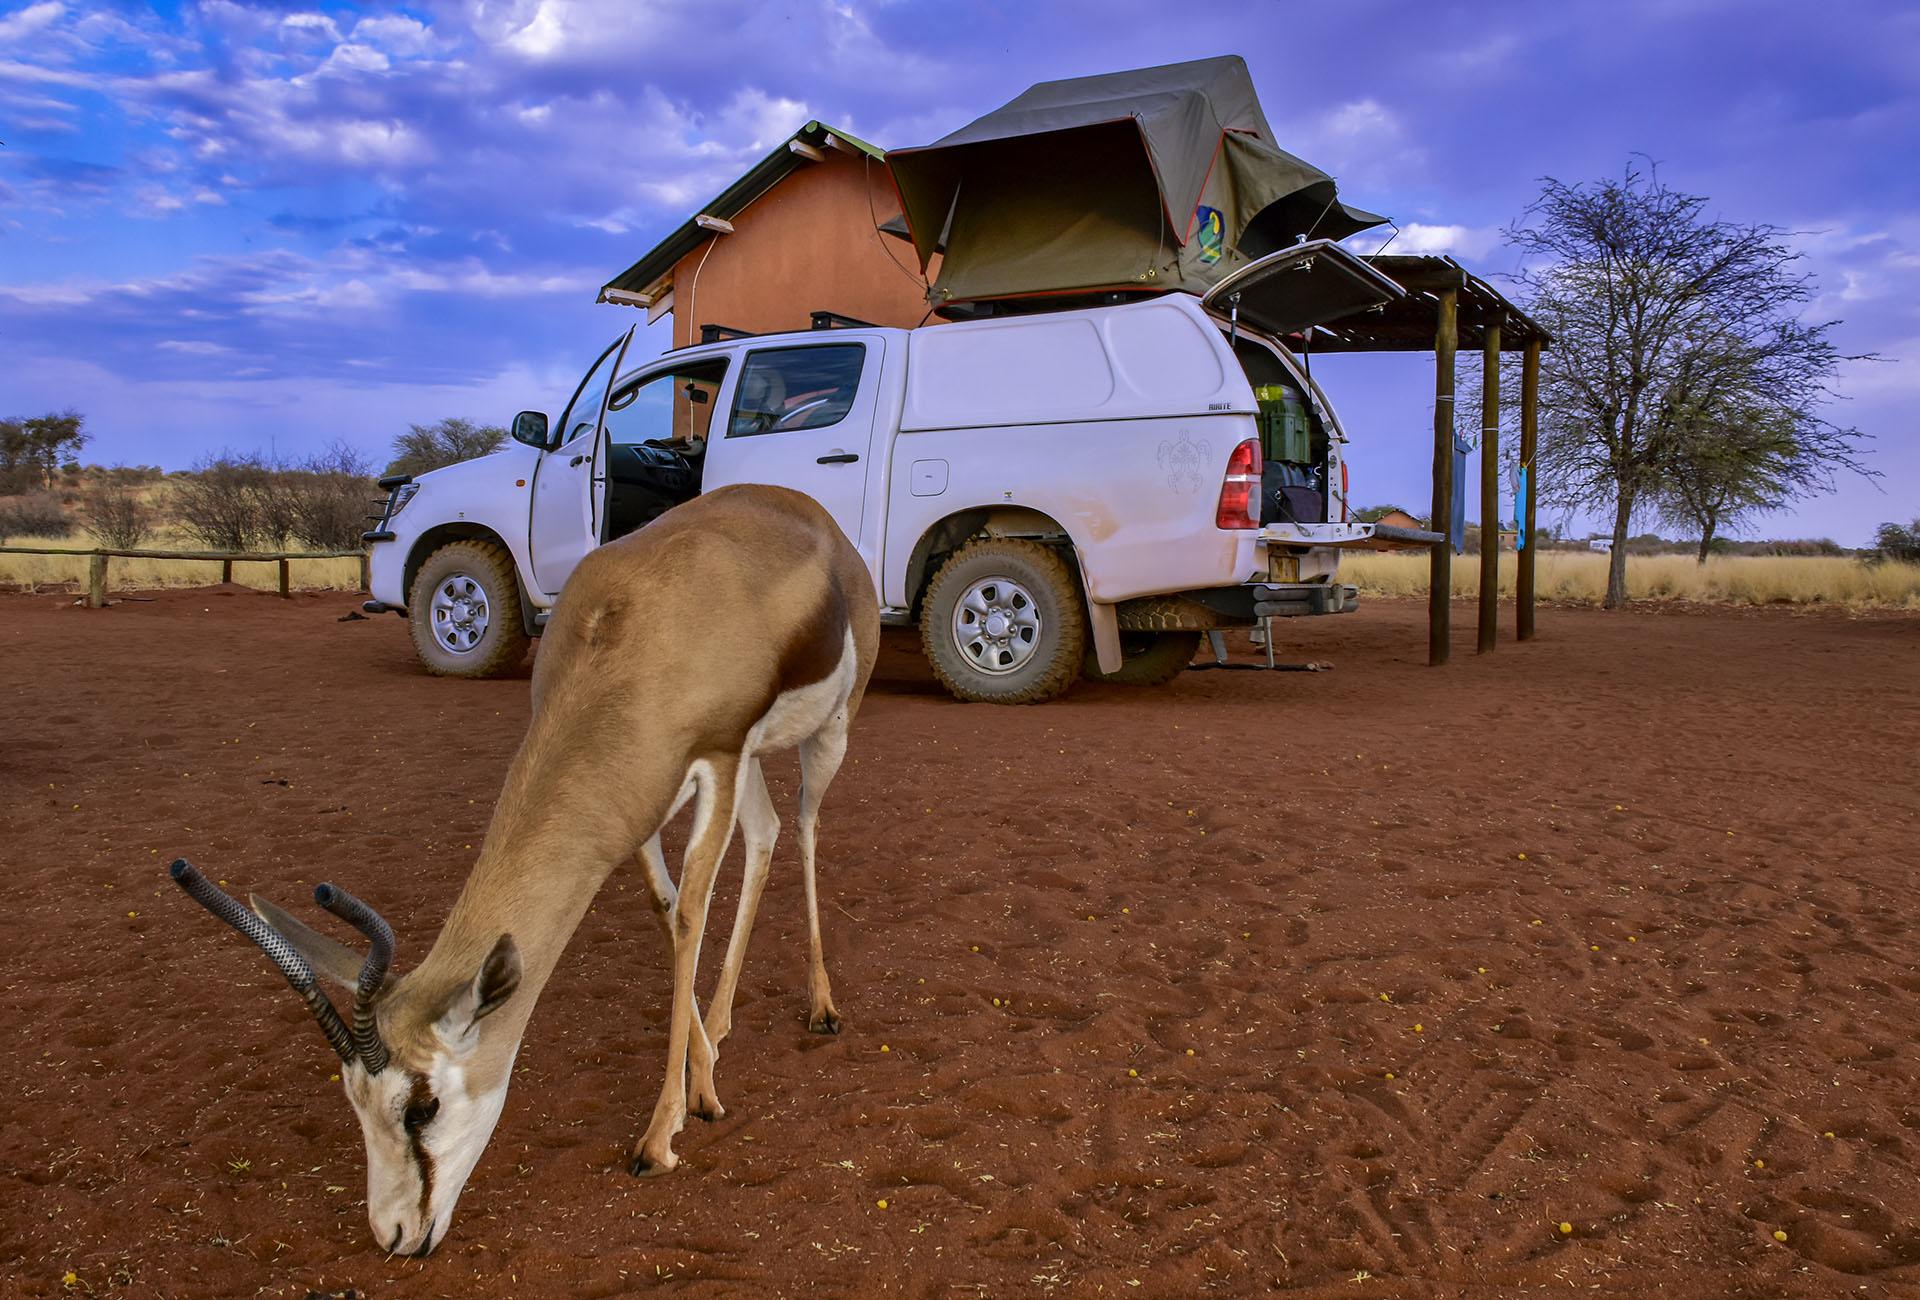 Namibie, safari, désert, animaux, campement